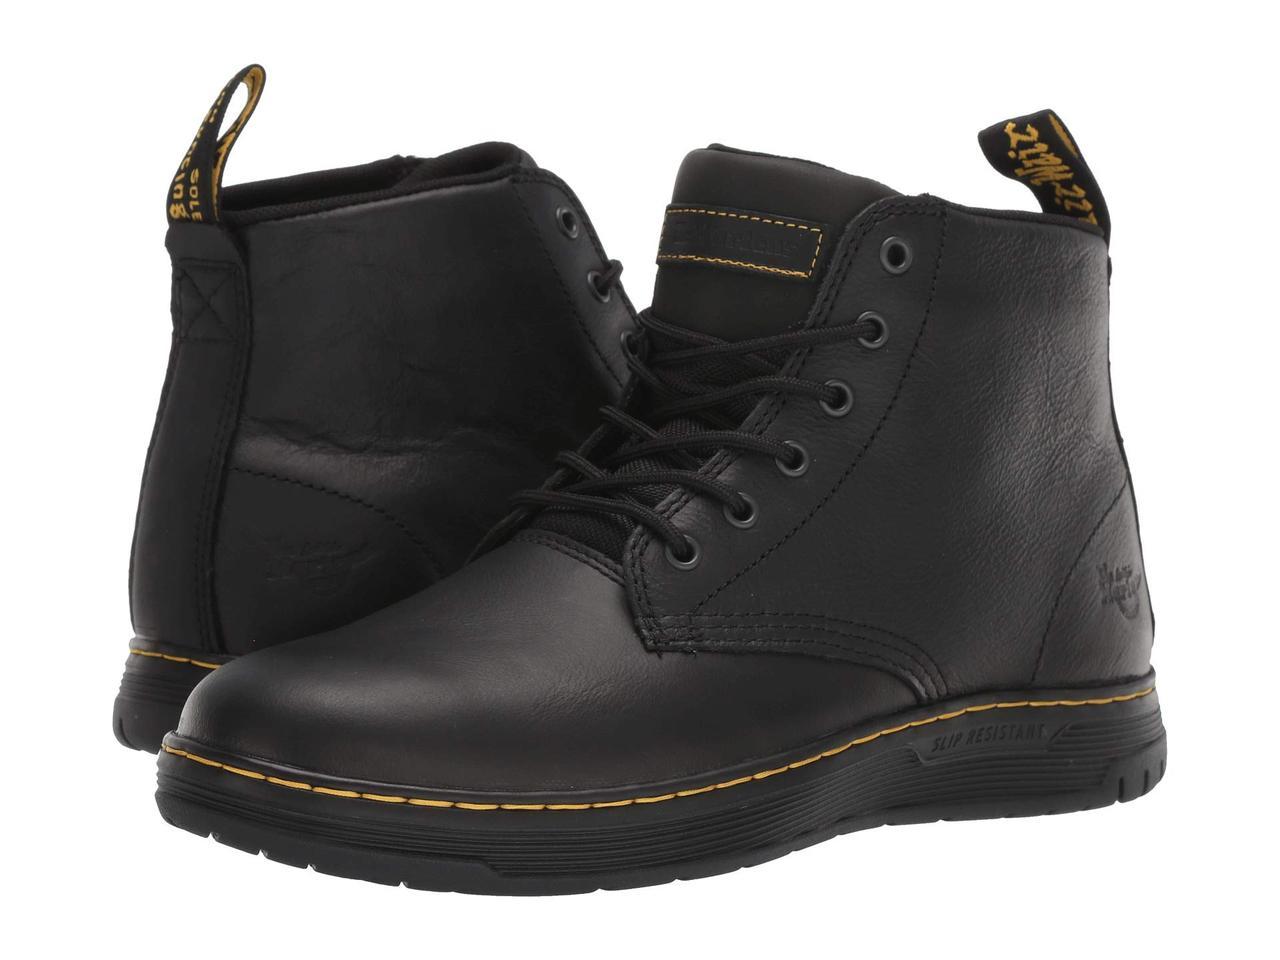 Ботинки/Сапоги (Оригинал) Dr. Martens Work Amwell SR Black/Black/Black/Black